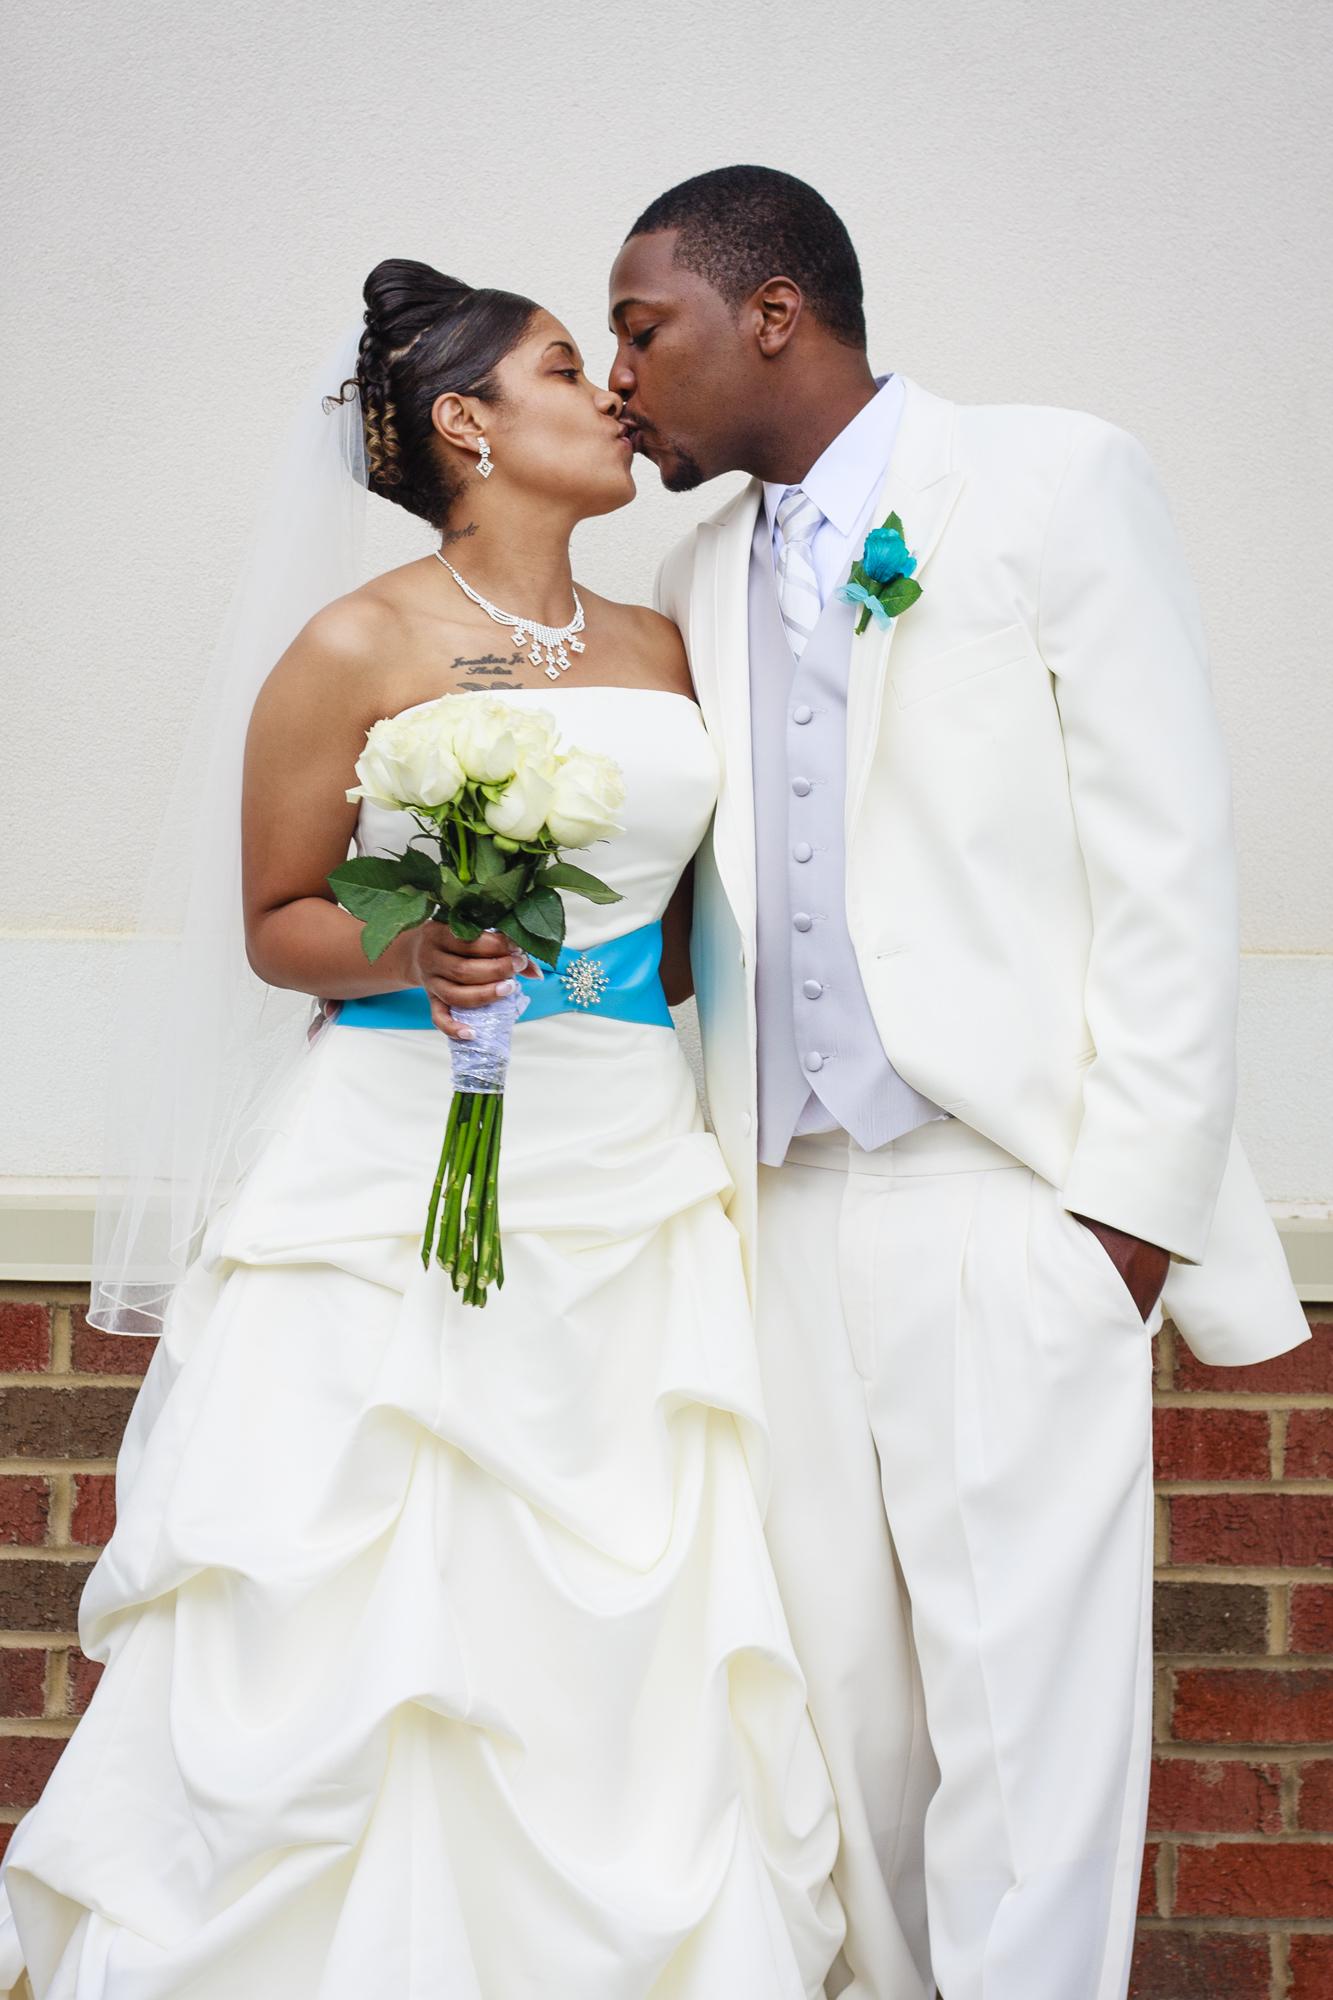 Wedding Photographer in Greensboro, NC